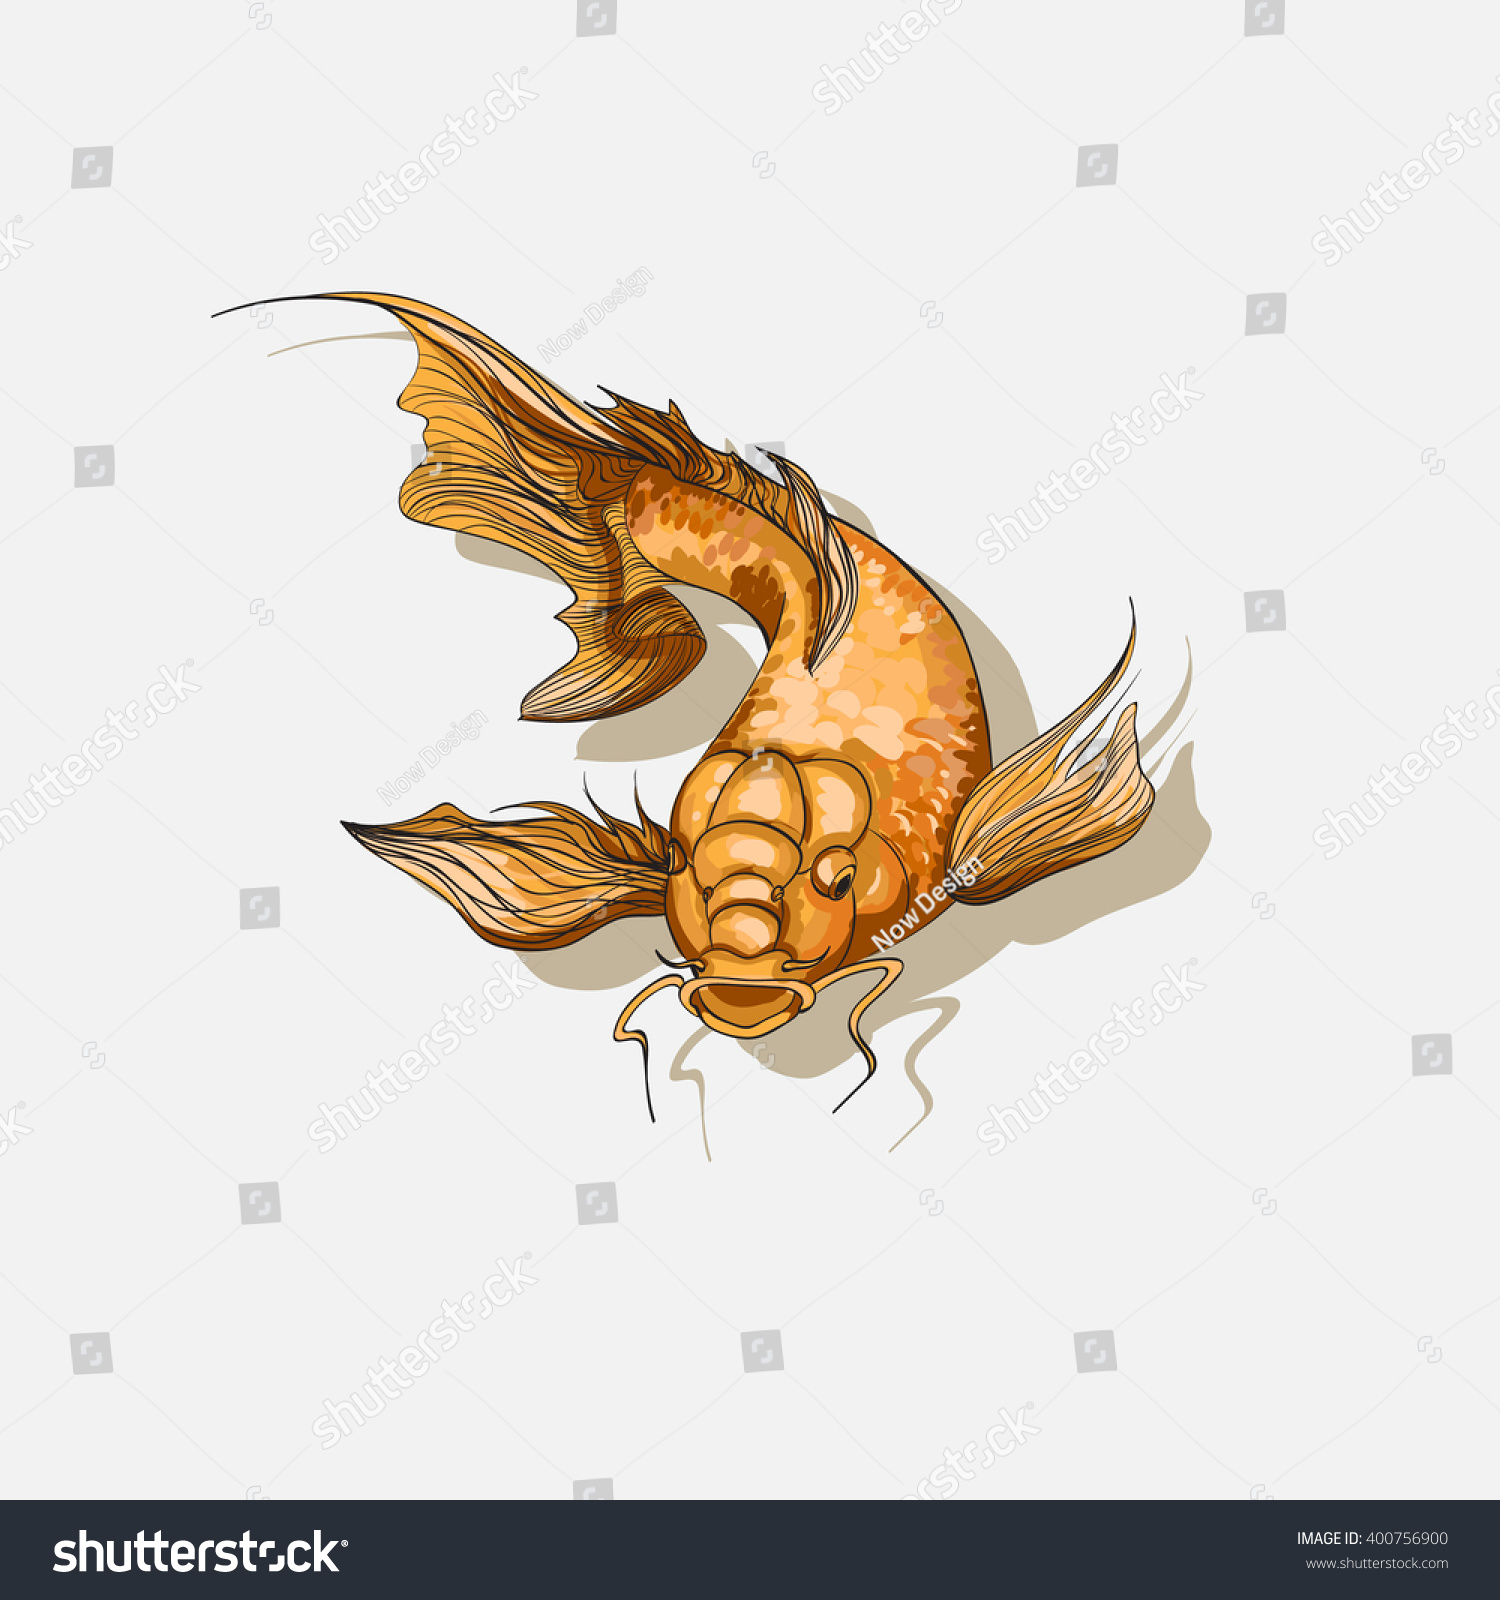 koi fish template for goldfish tattoo stock vector illustration koi fish template for goldfish tattoo